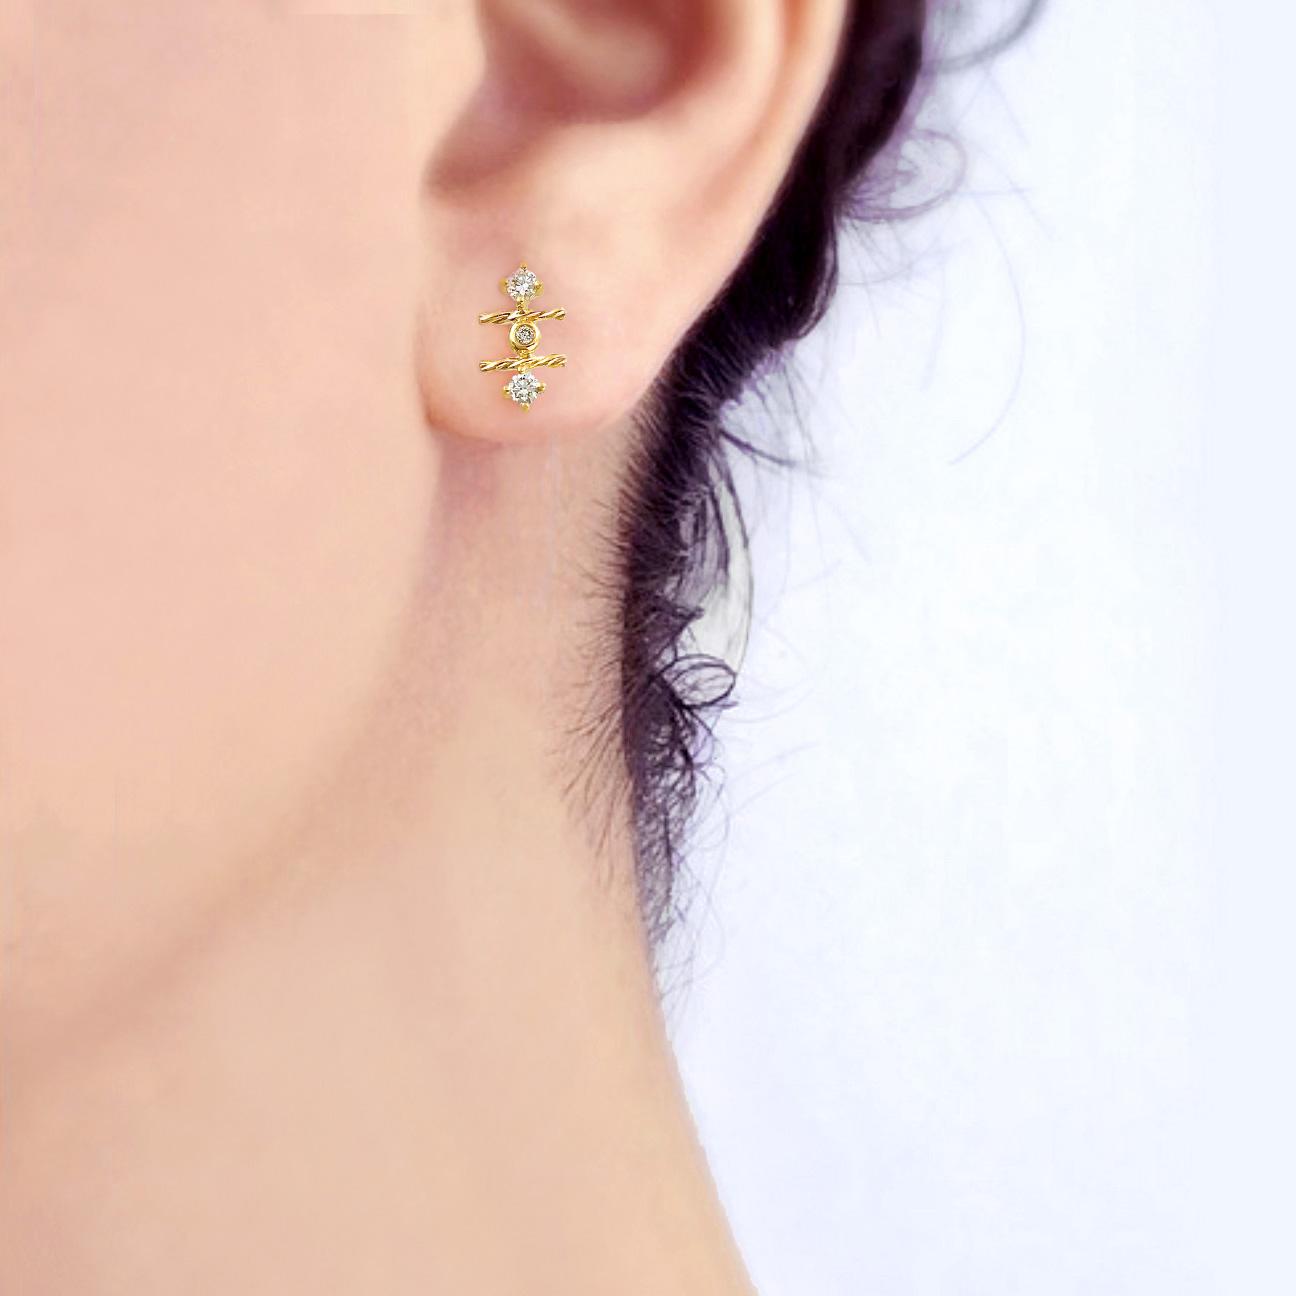 18k-gold-diamond-mix-setting-signature-twist-Stud-Earrings-jewelyrie-C